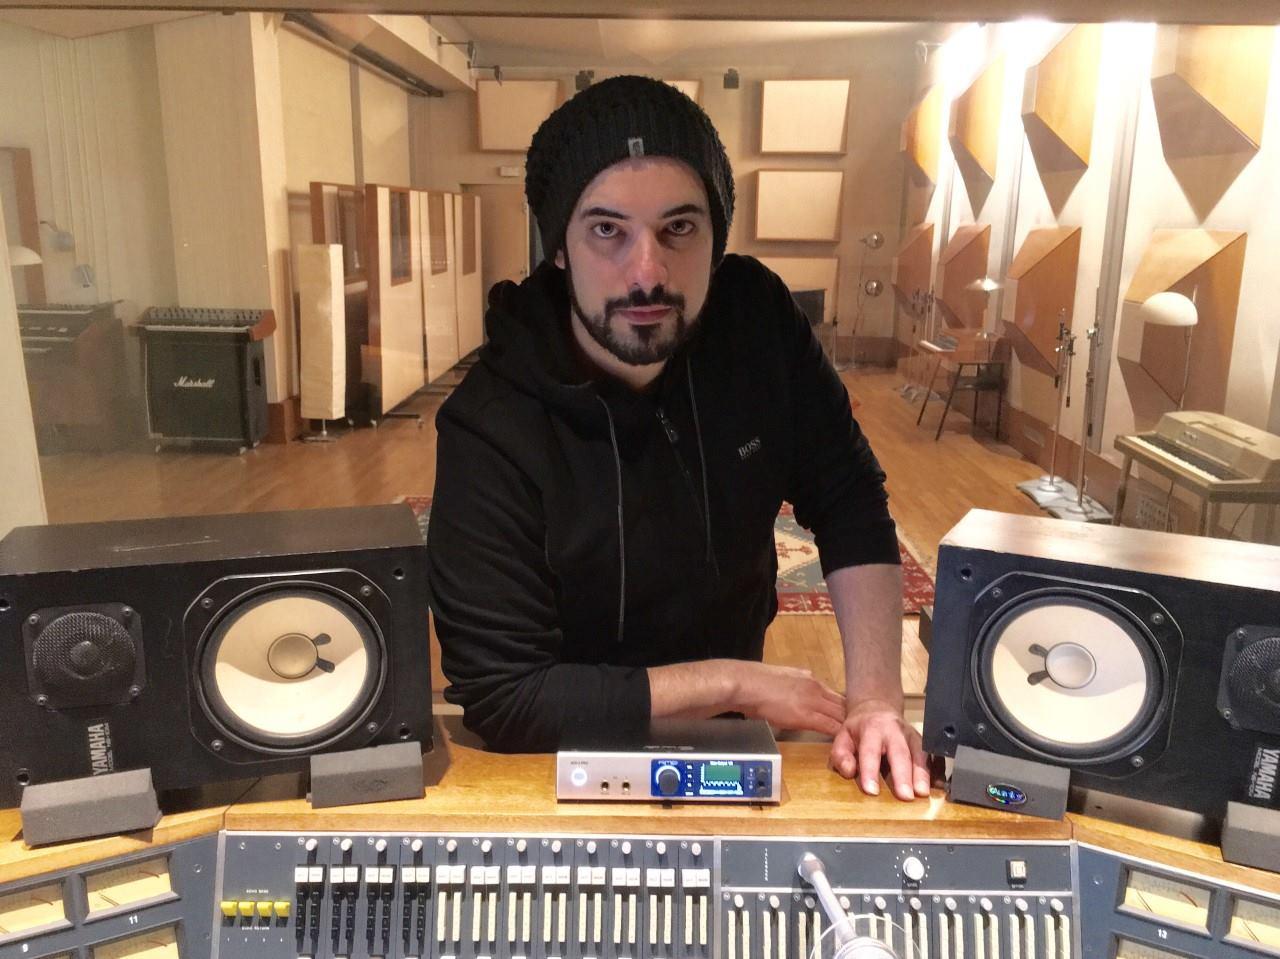 RME ADI-2 Pro - Phil Greiss - Synthax Audio UK